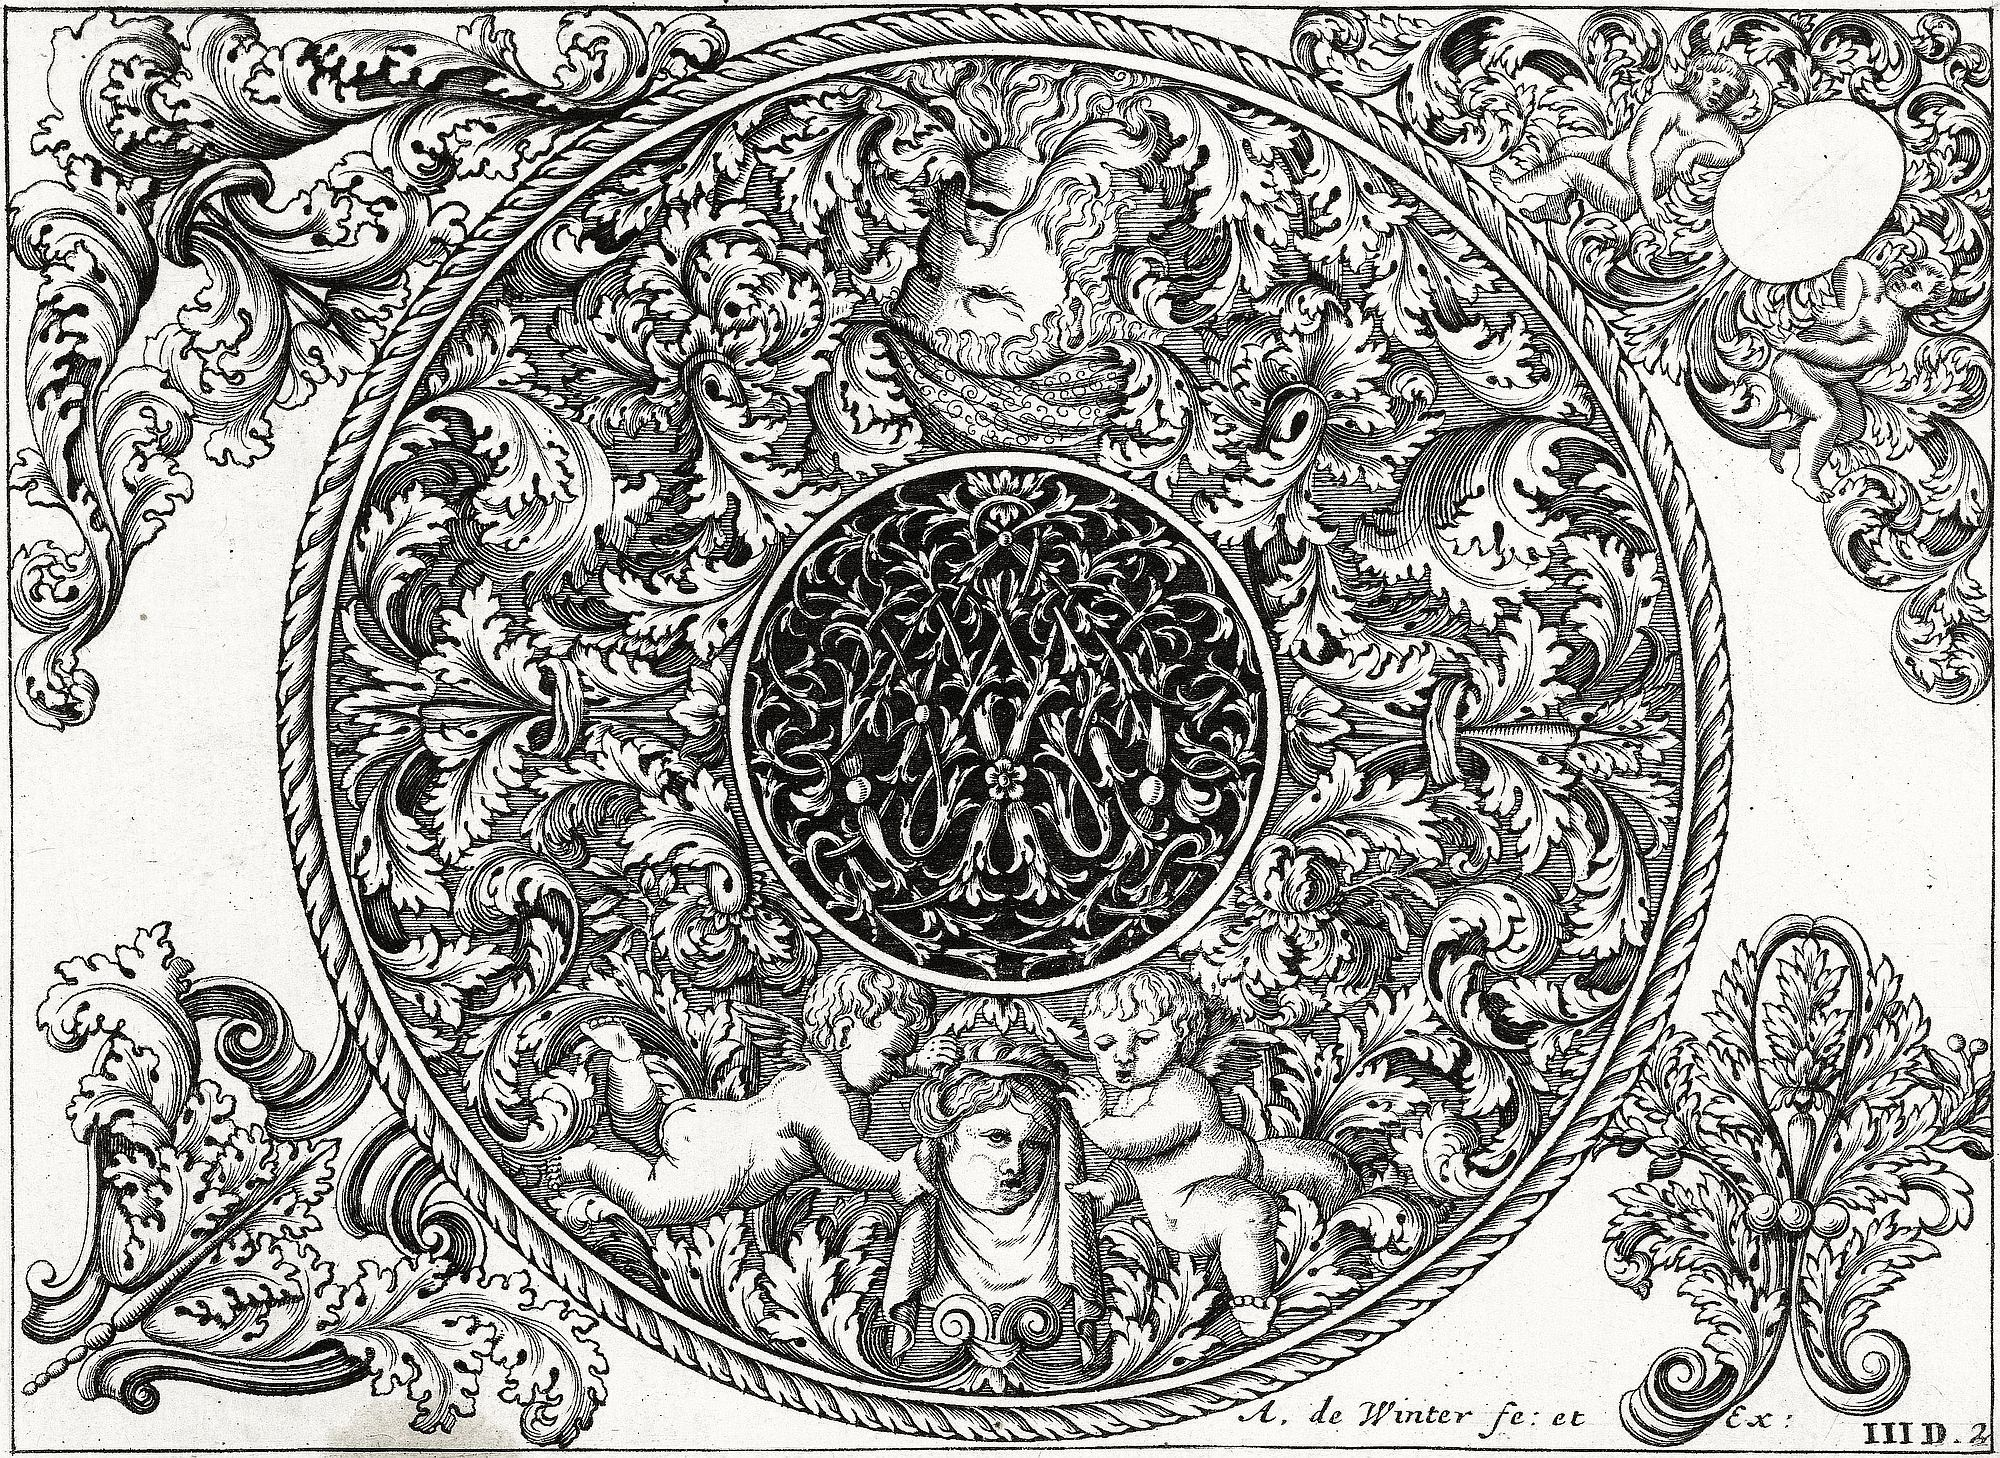 Baroque Mandala Vintage Art Printable Coloring Page Intricate Etsy Printable Art Vintage Art Printable Coloring Pages